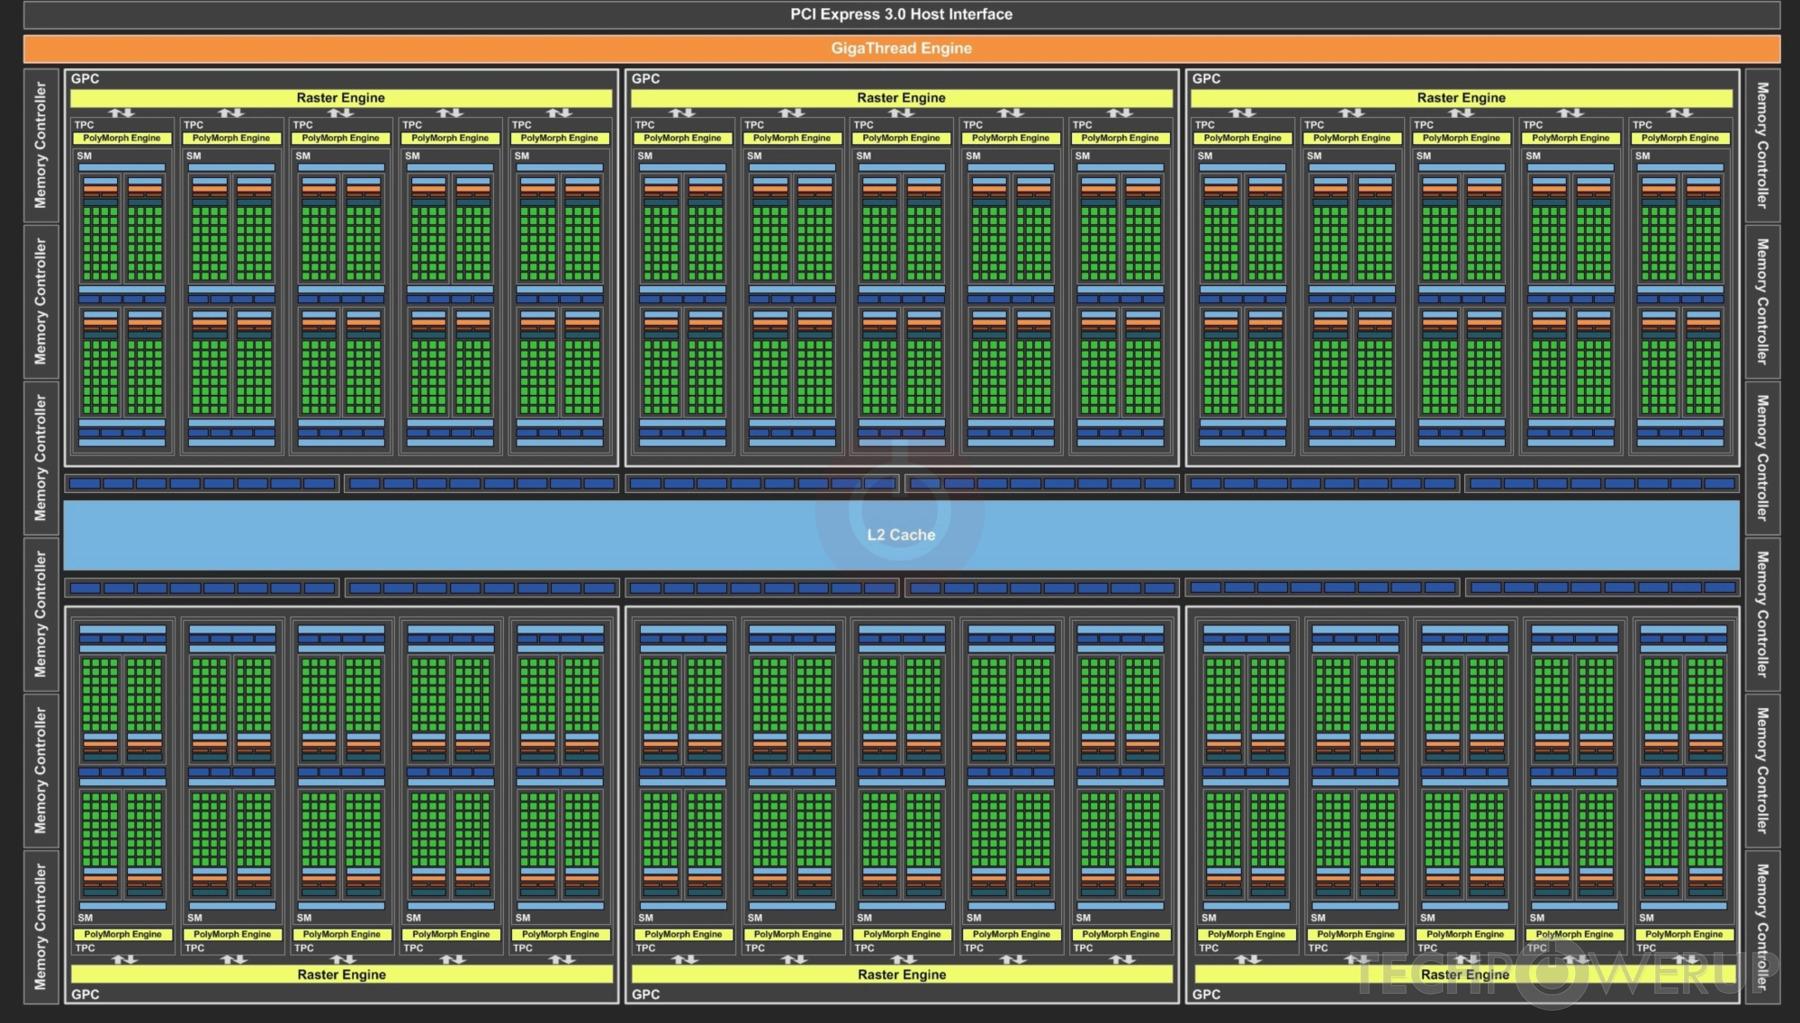 NVIDIA GP102 GPU Specs   TechPowerUp GPU Database